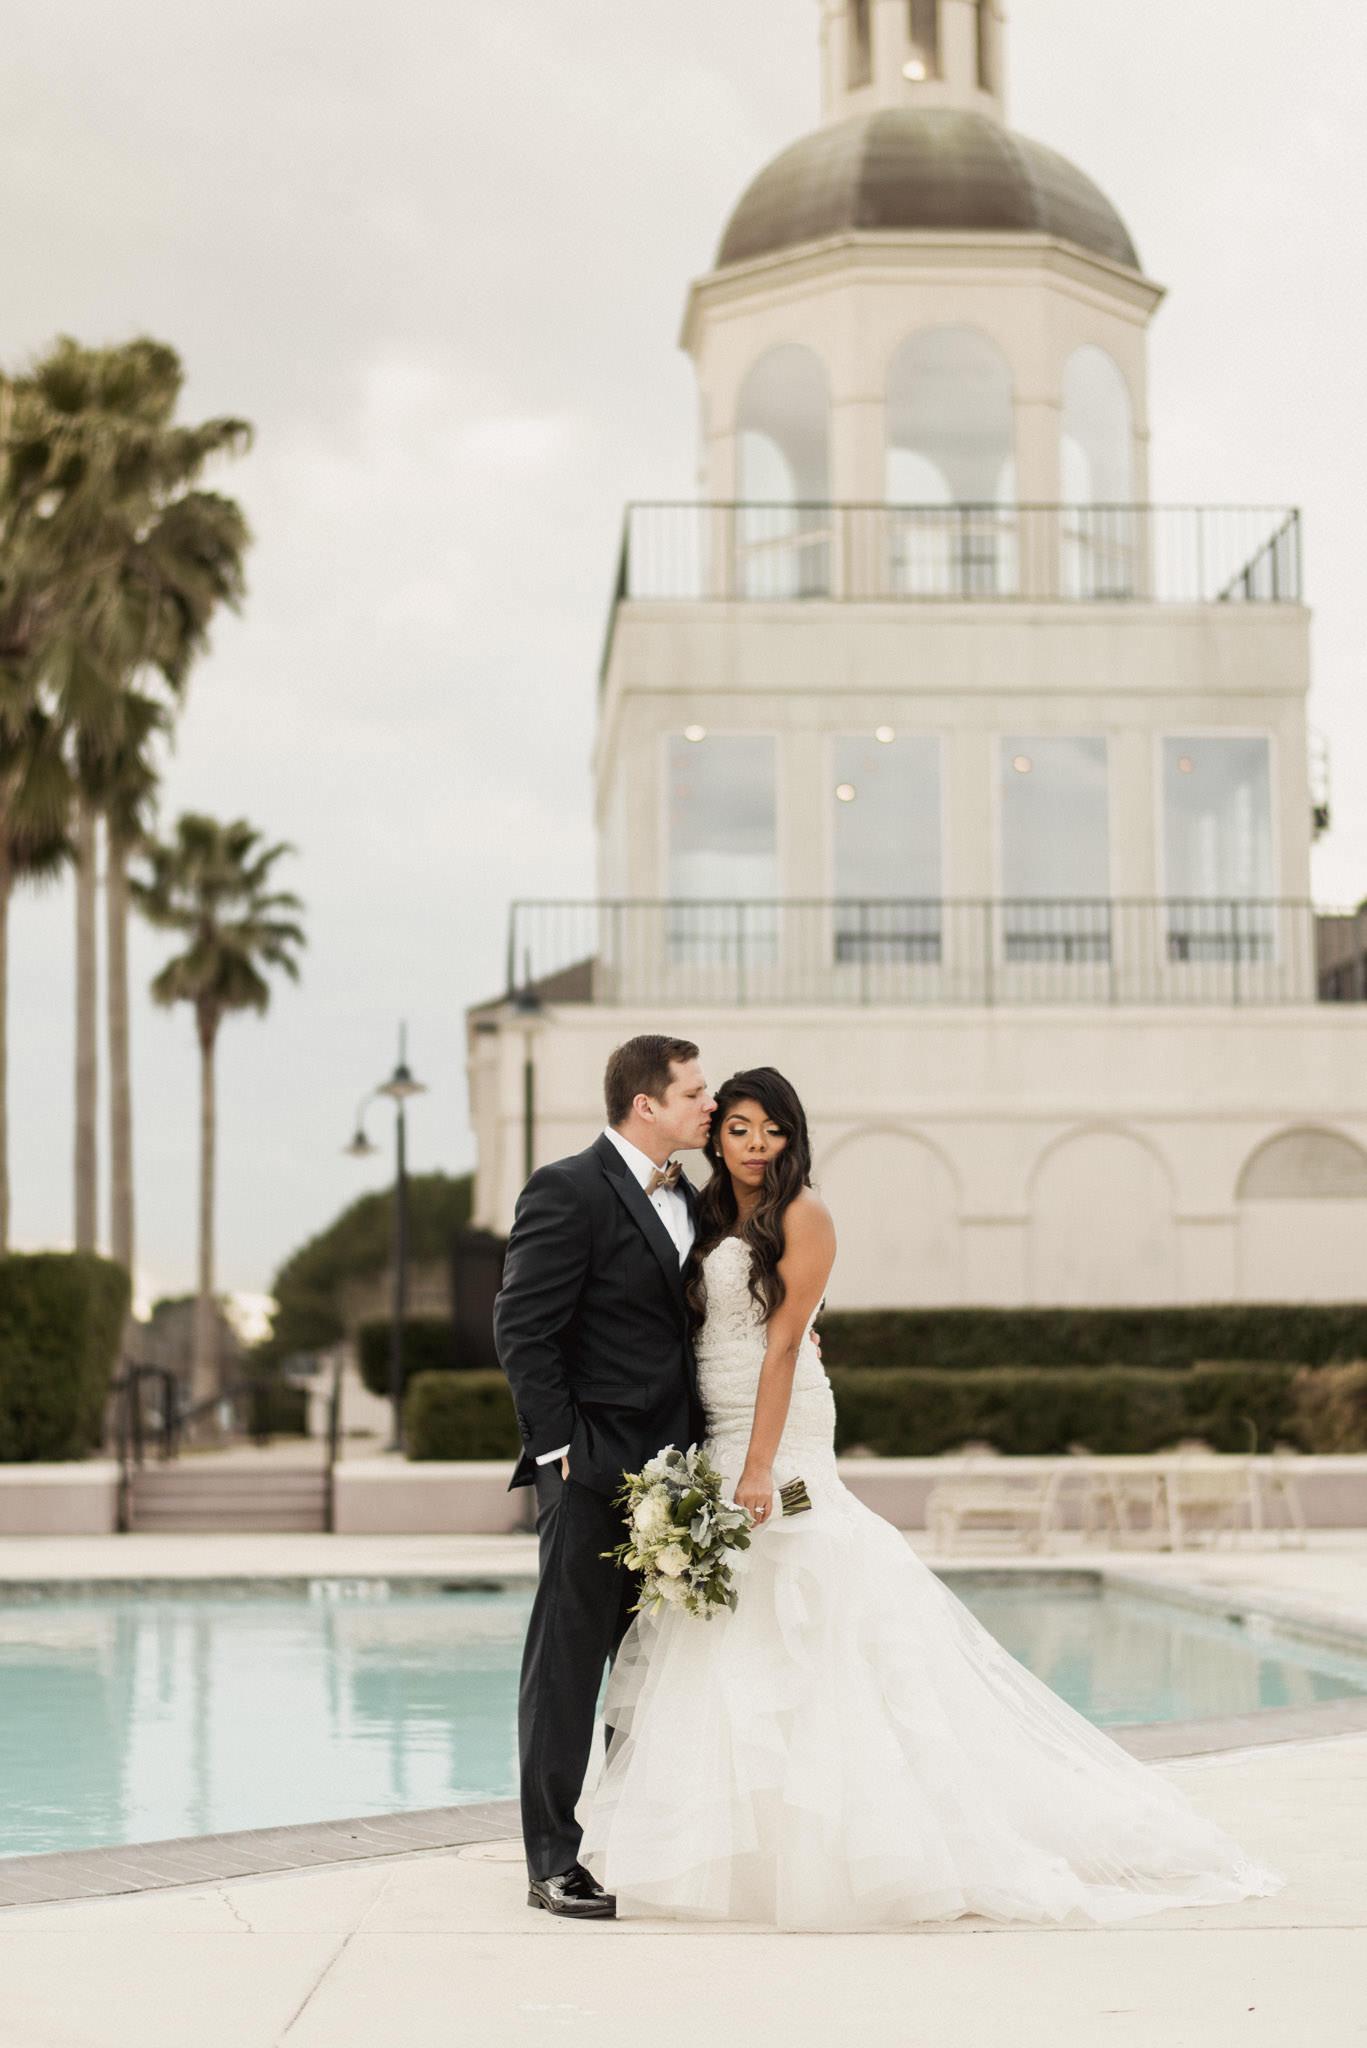 maria-william-montgomery-tx-wedding-bentwater-country-club-sm2.jpg